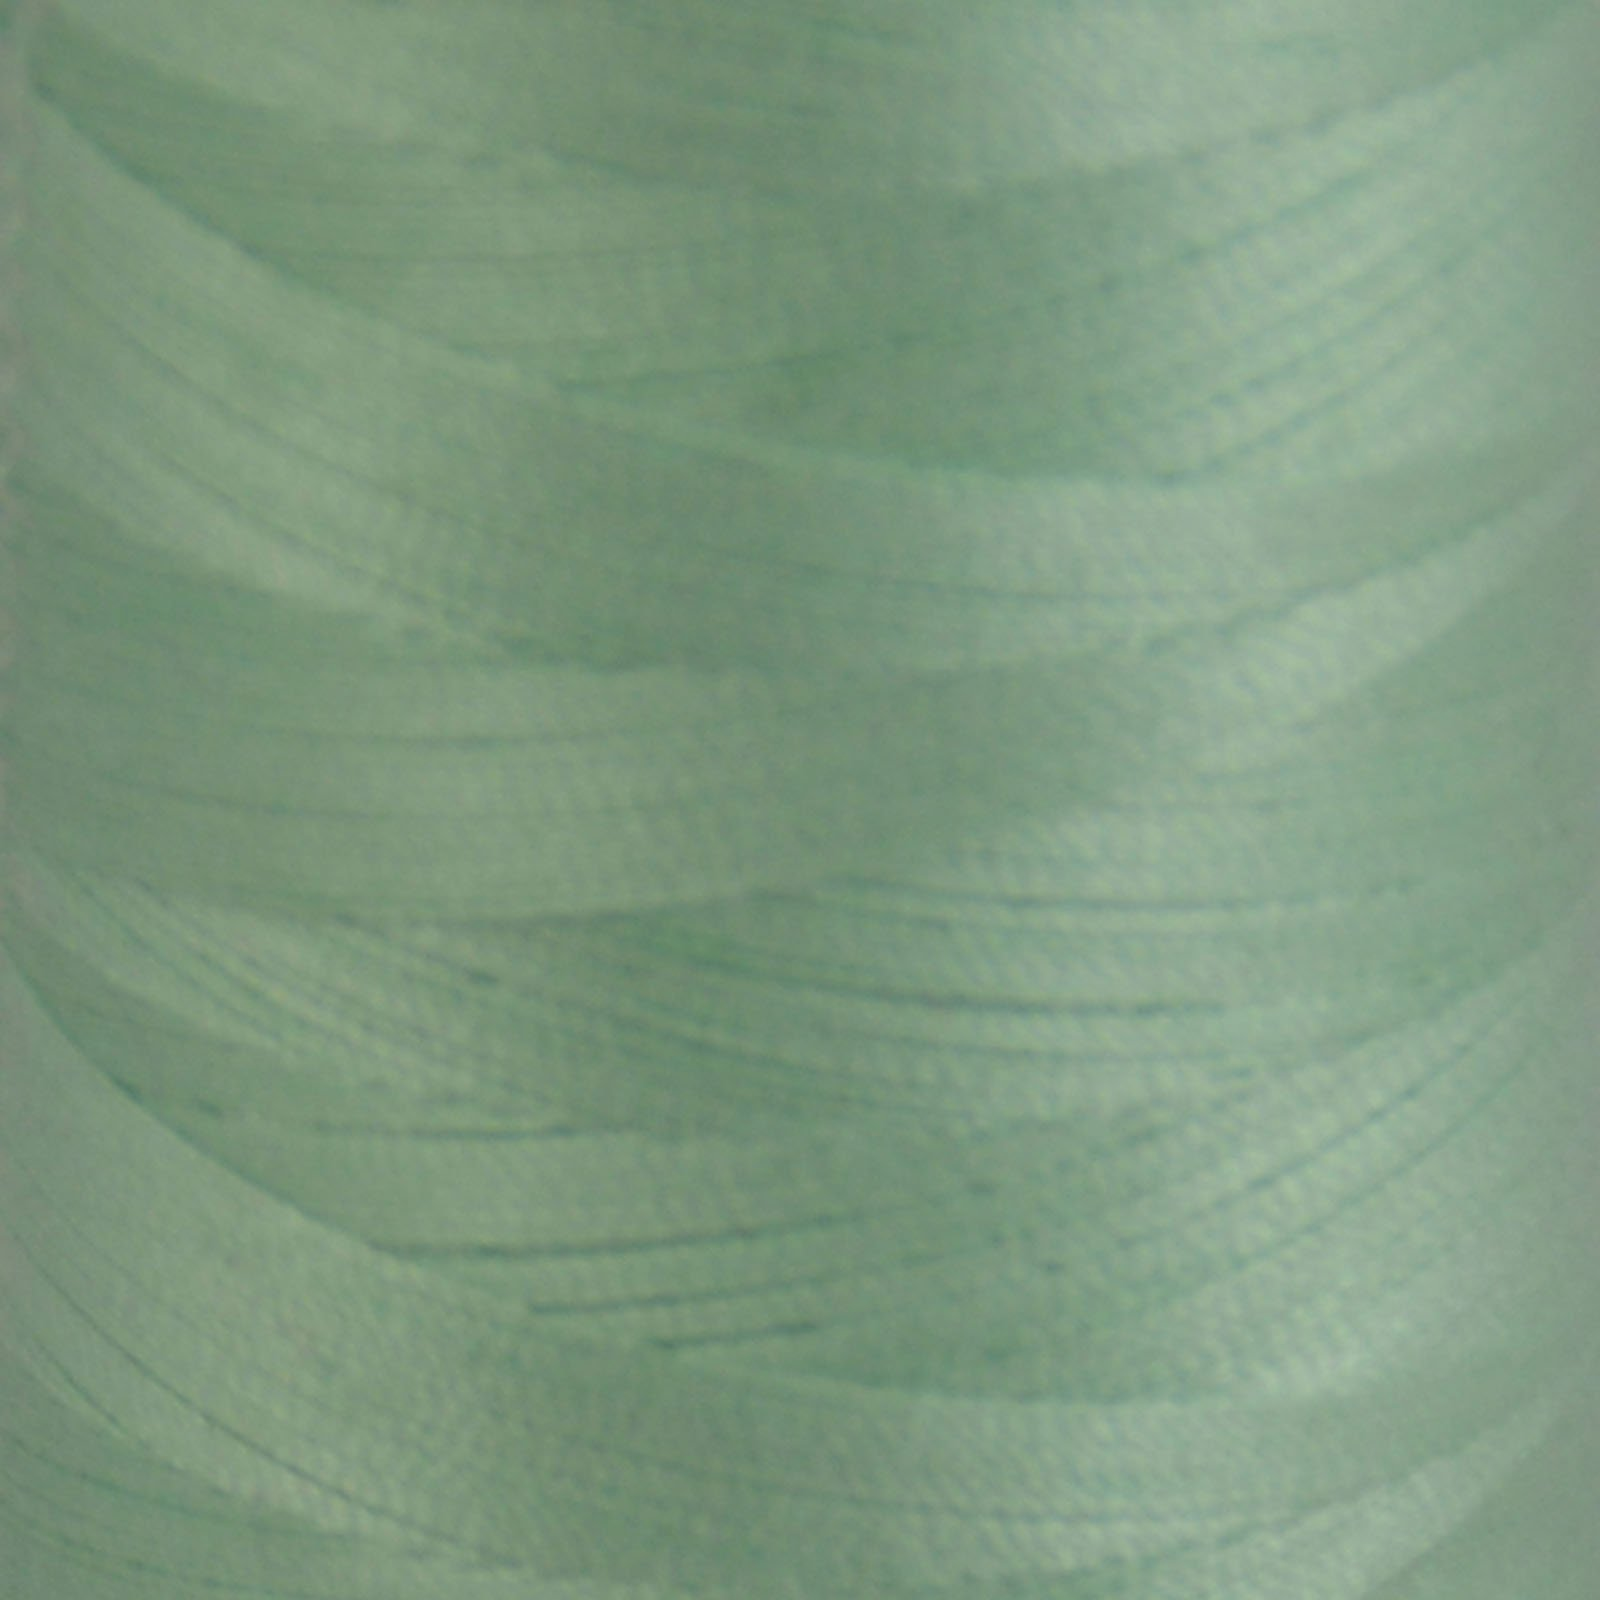 # 2830 Mint